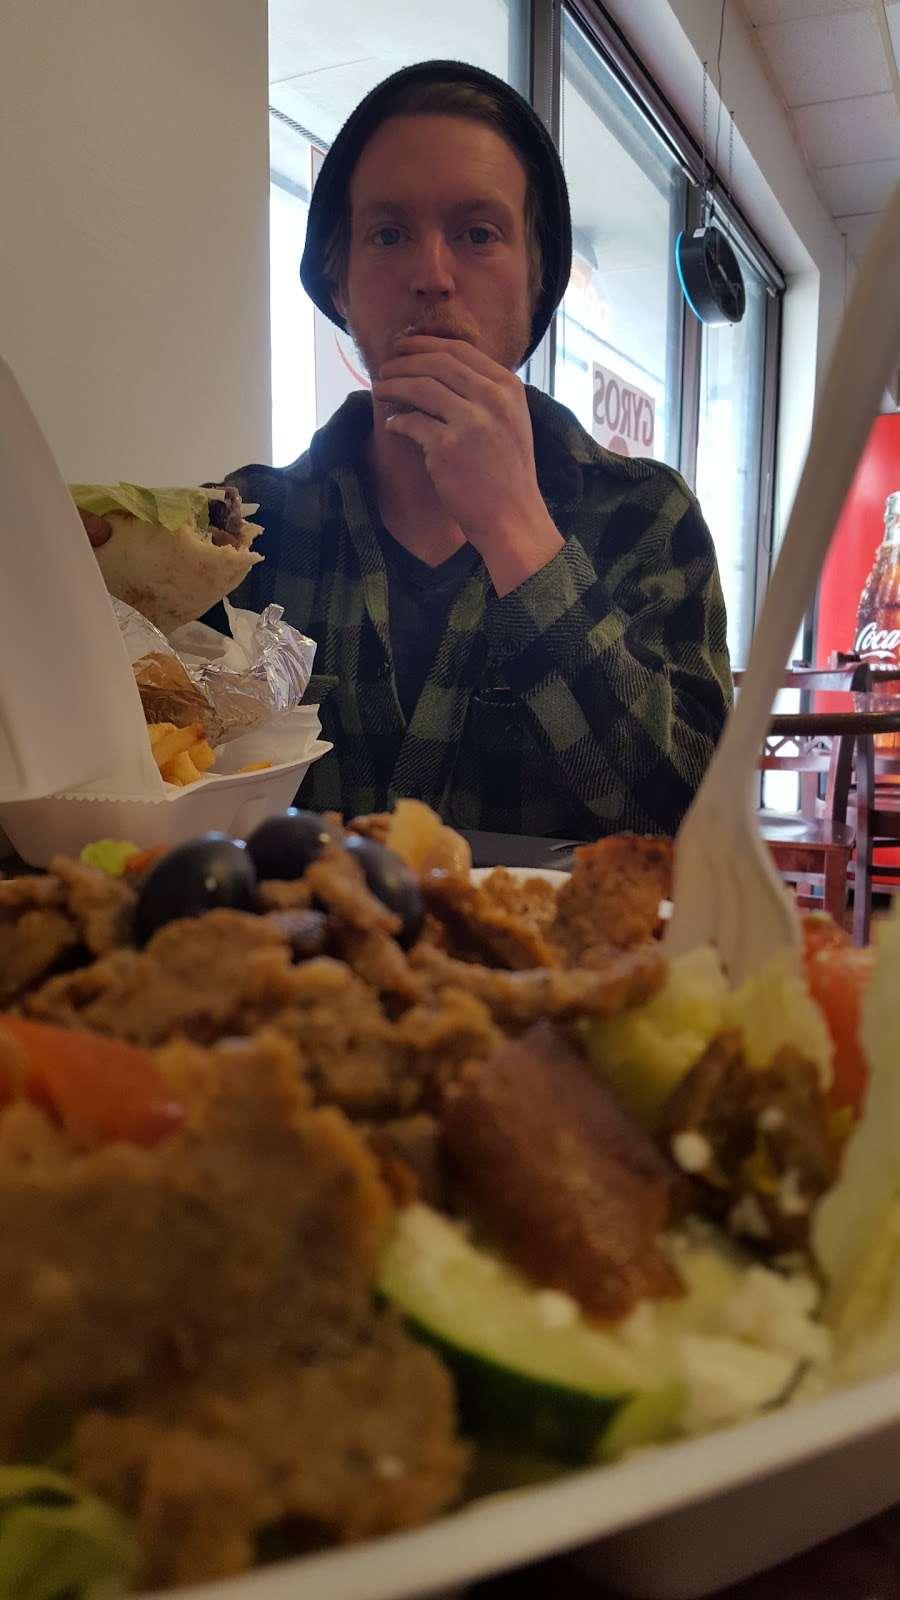 Jordans Fish Chicken & Gyros - restaurant  | Photo 5 of 6 | Address: 6165 Allisonville Rd, Indianapolis, IN 46220, USA | Phone: (317) 254-4444